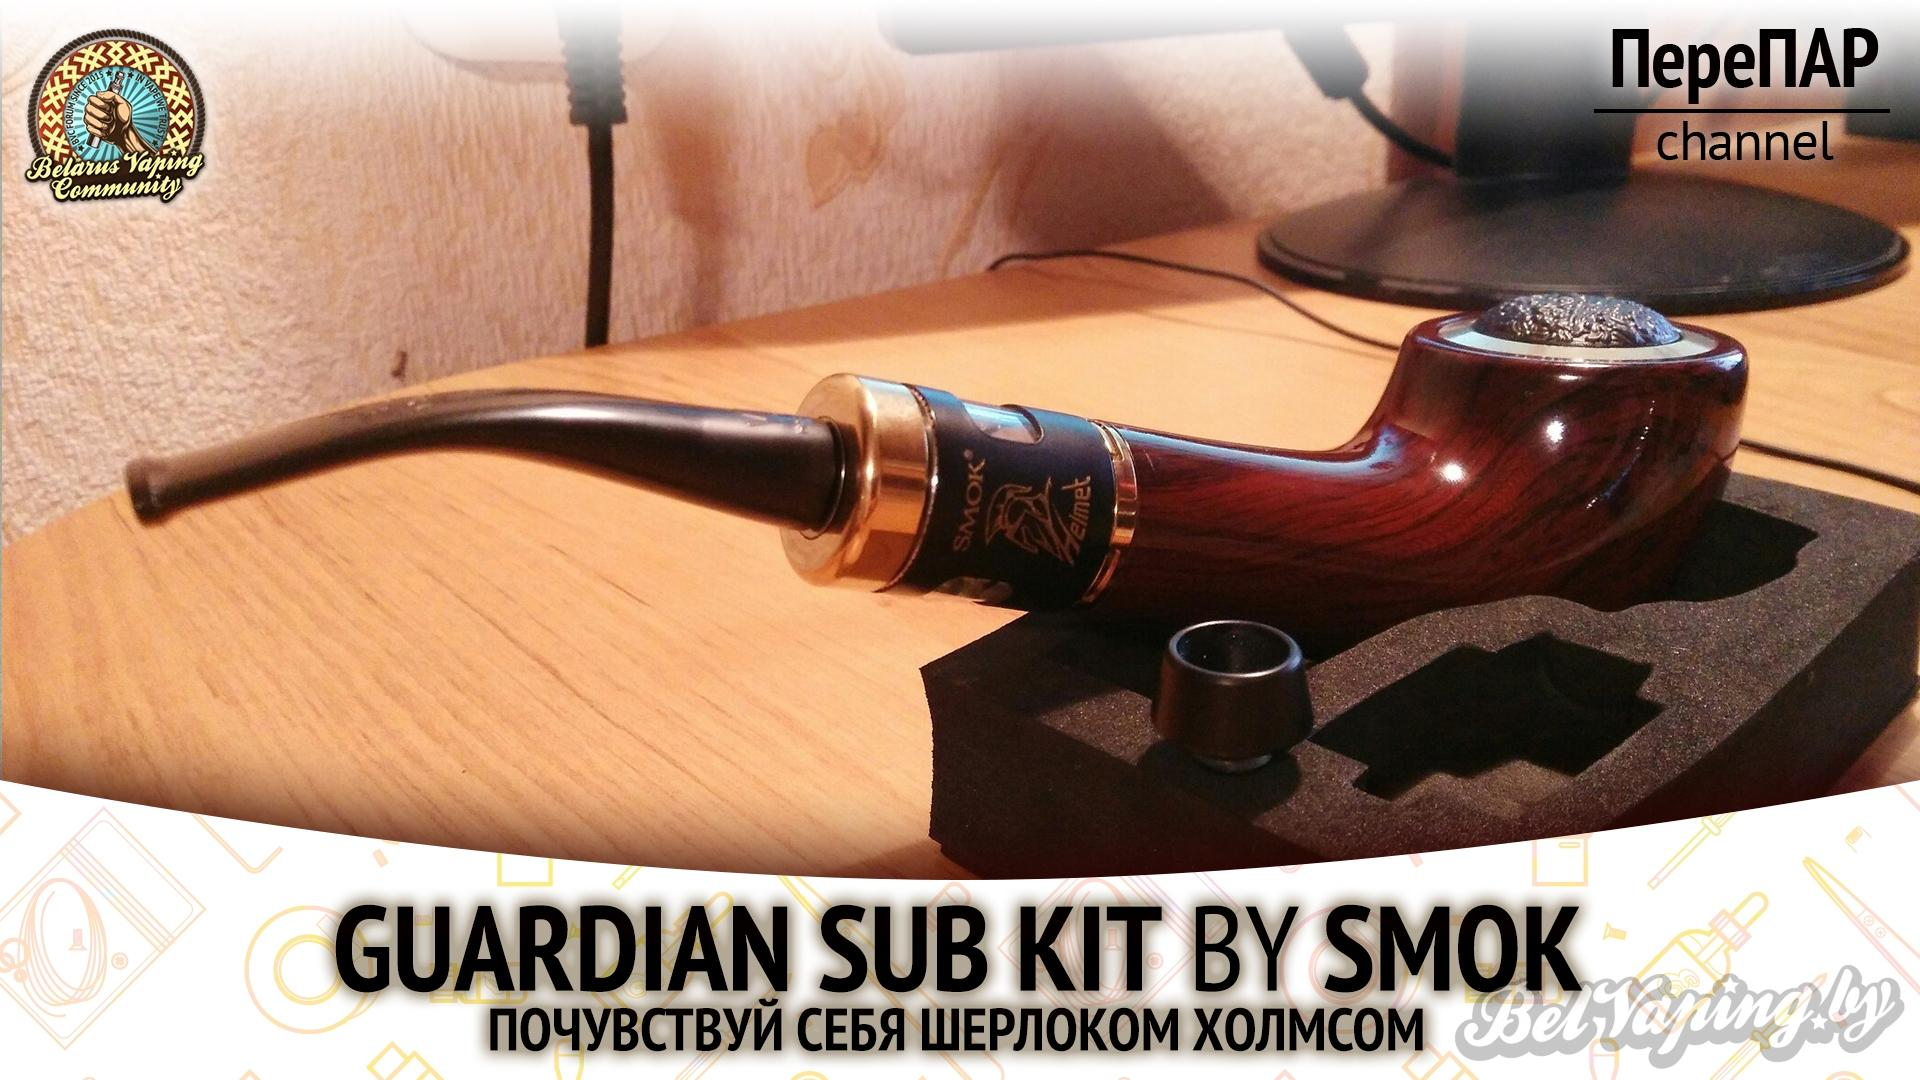 Обзор электронной трубки Guardian Sub Kit от SMOK